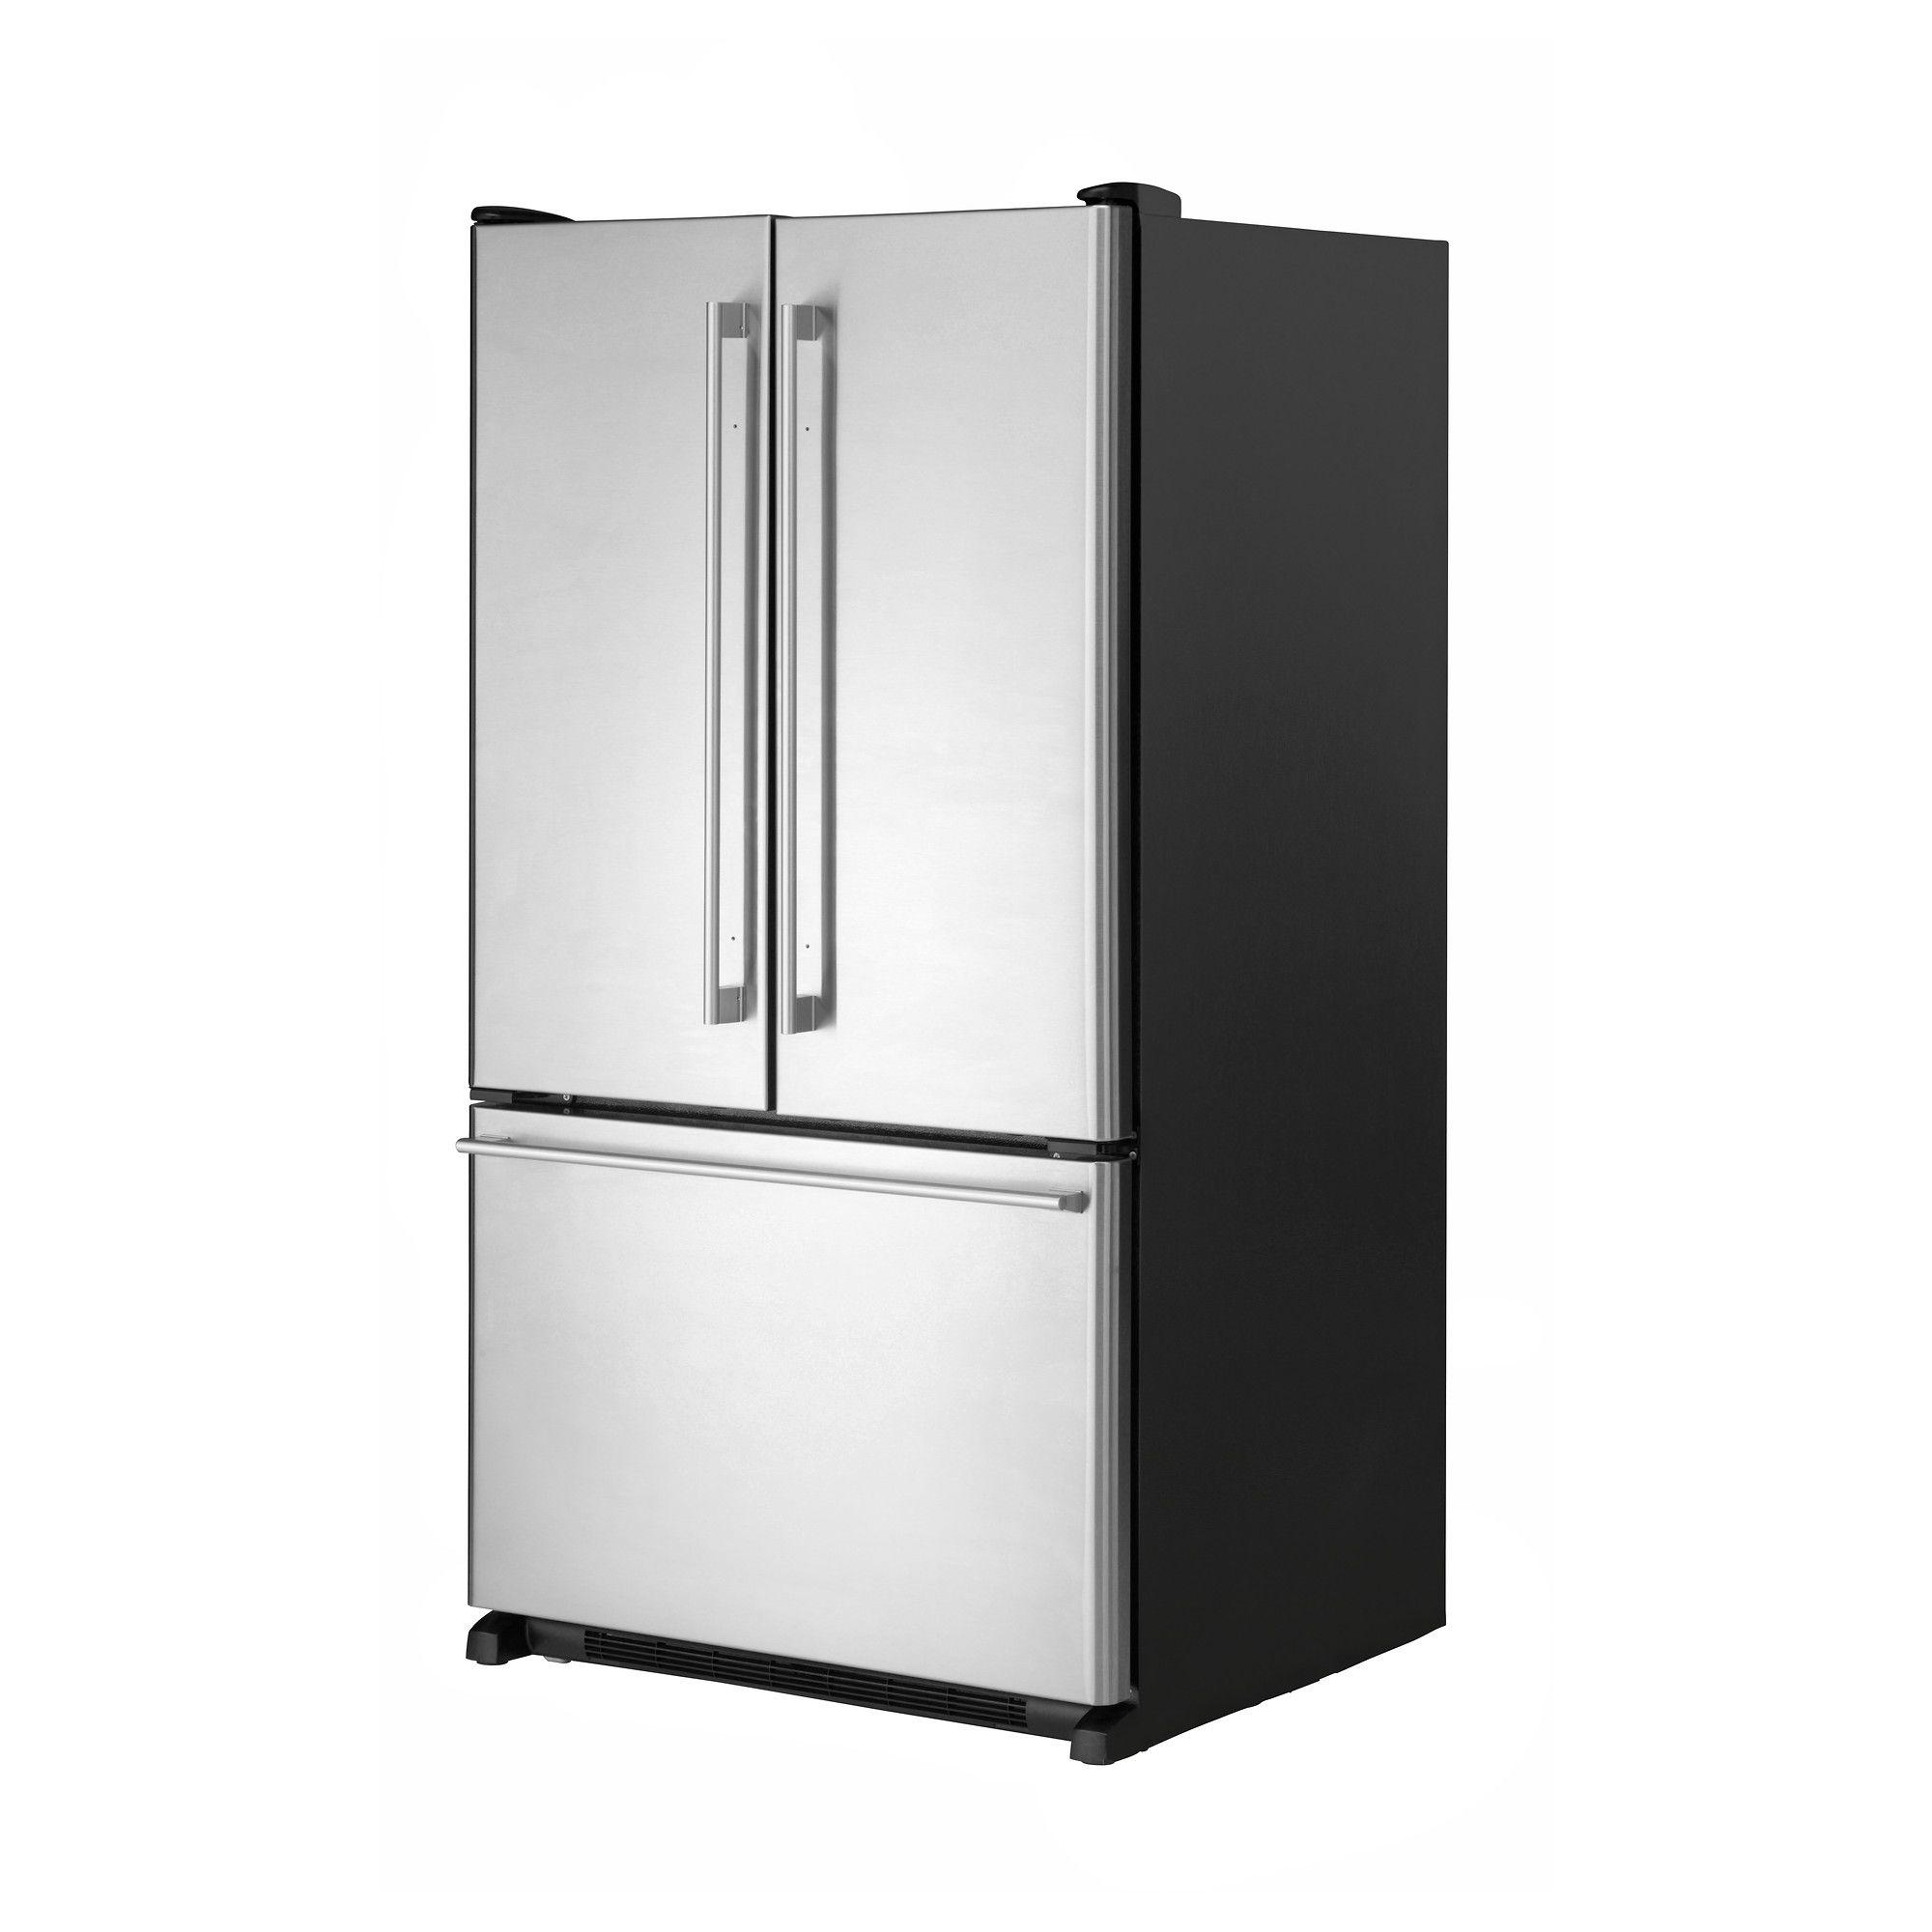 nutid fridge freezer ikea similar the the samsung. Black Bedroom Furniture Sets. Home Design Ideas